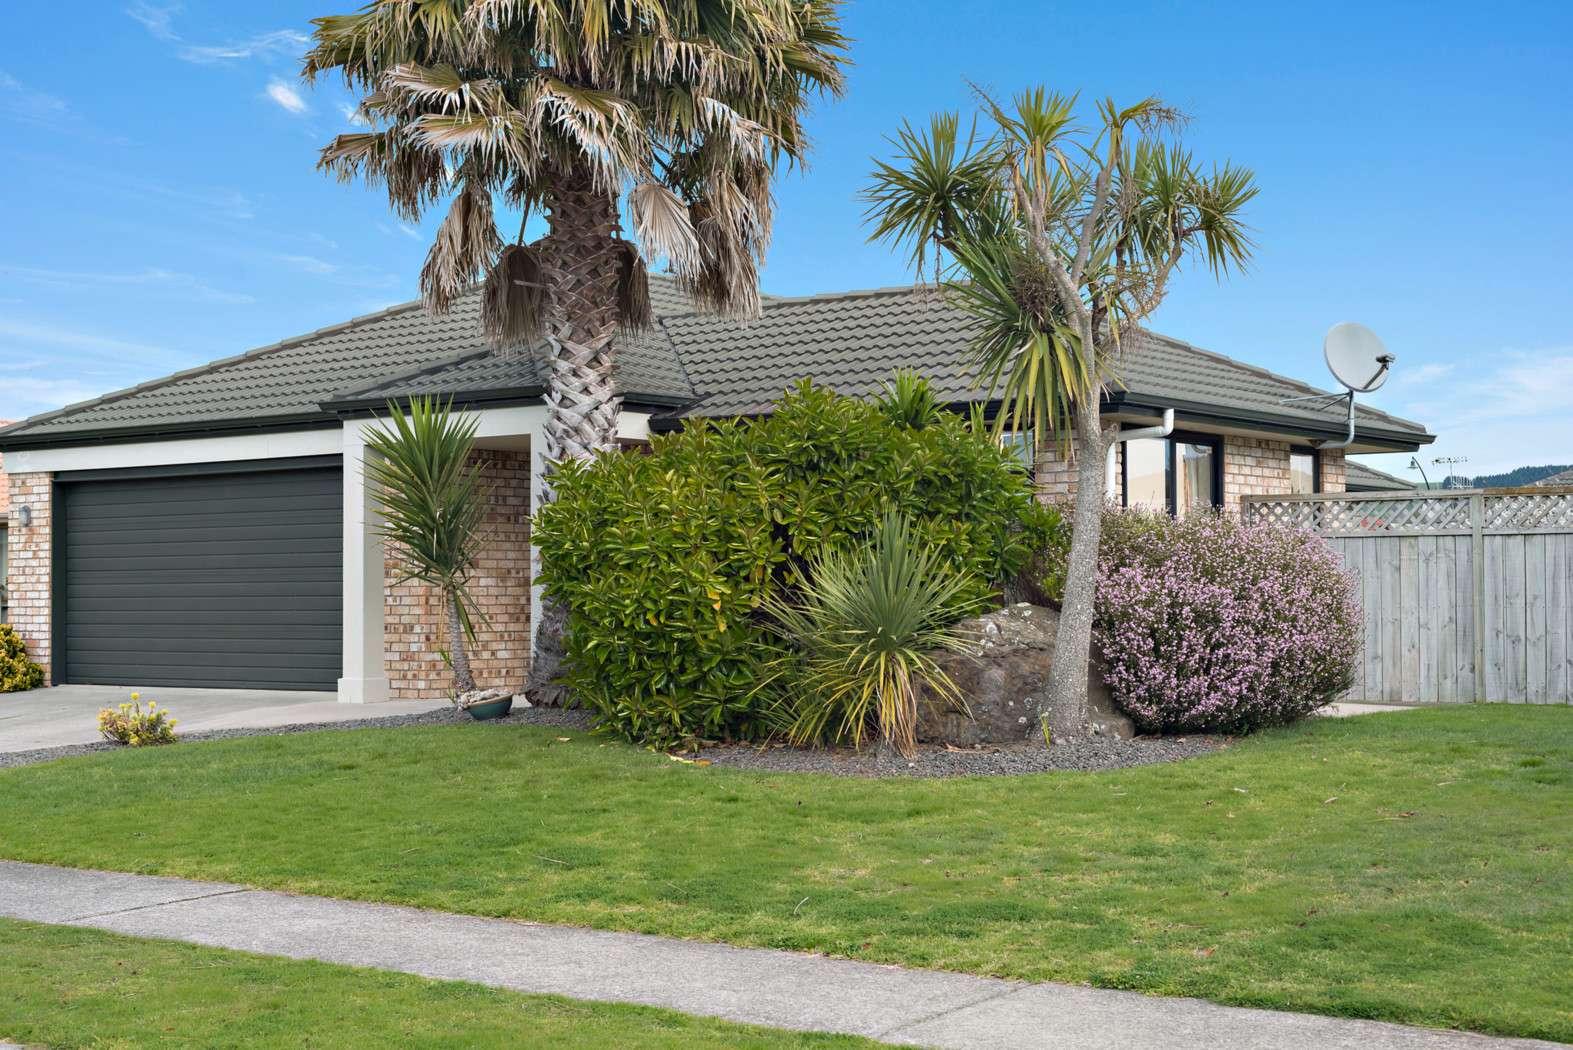 59 Pacific Cove Drive, Papamoa, Tauranga City 3187